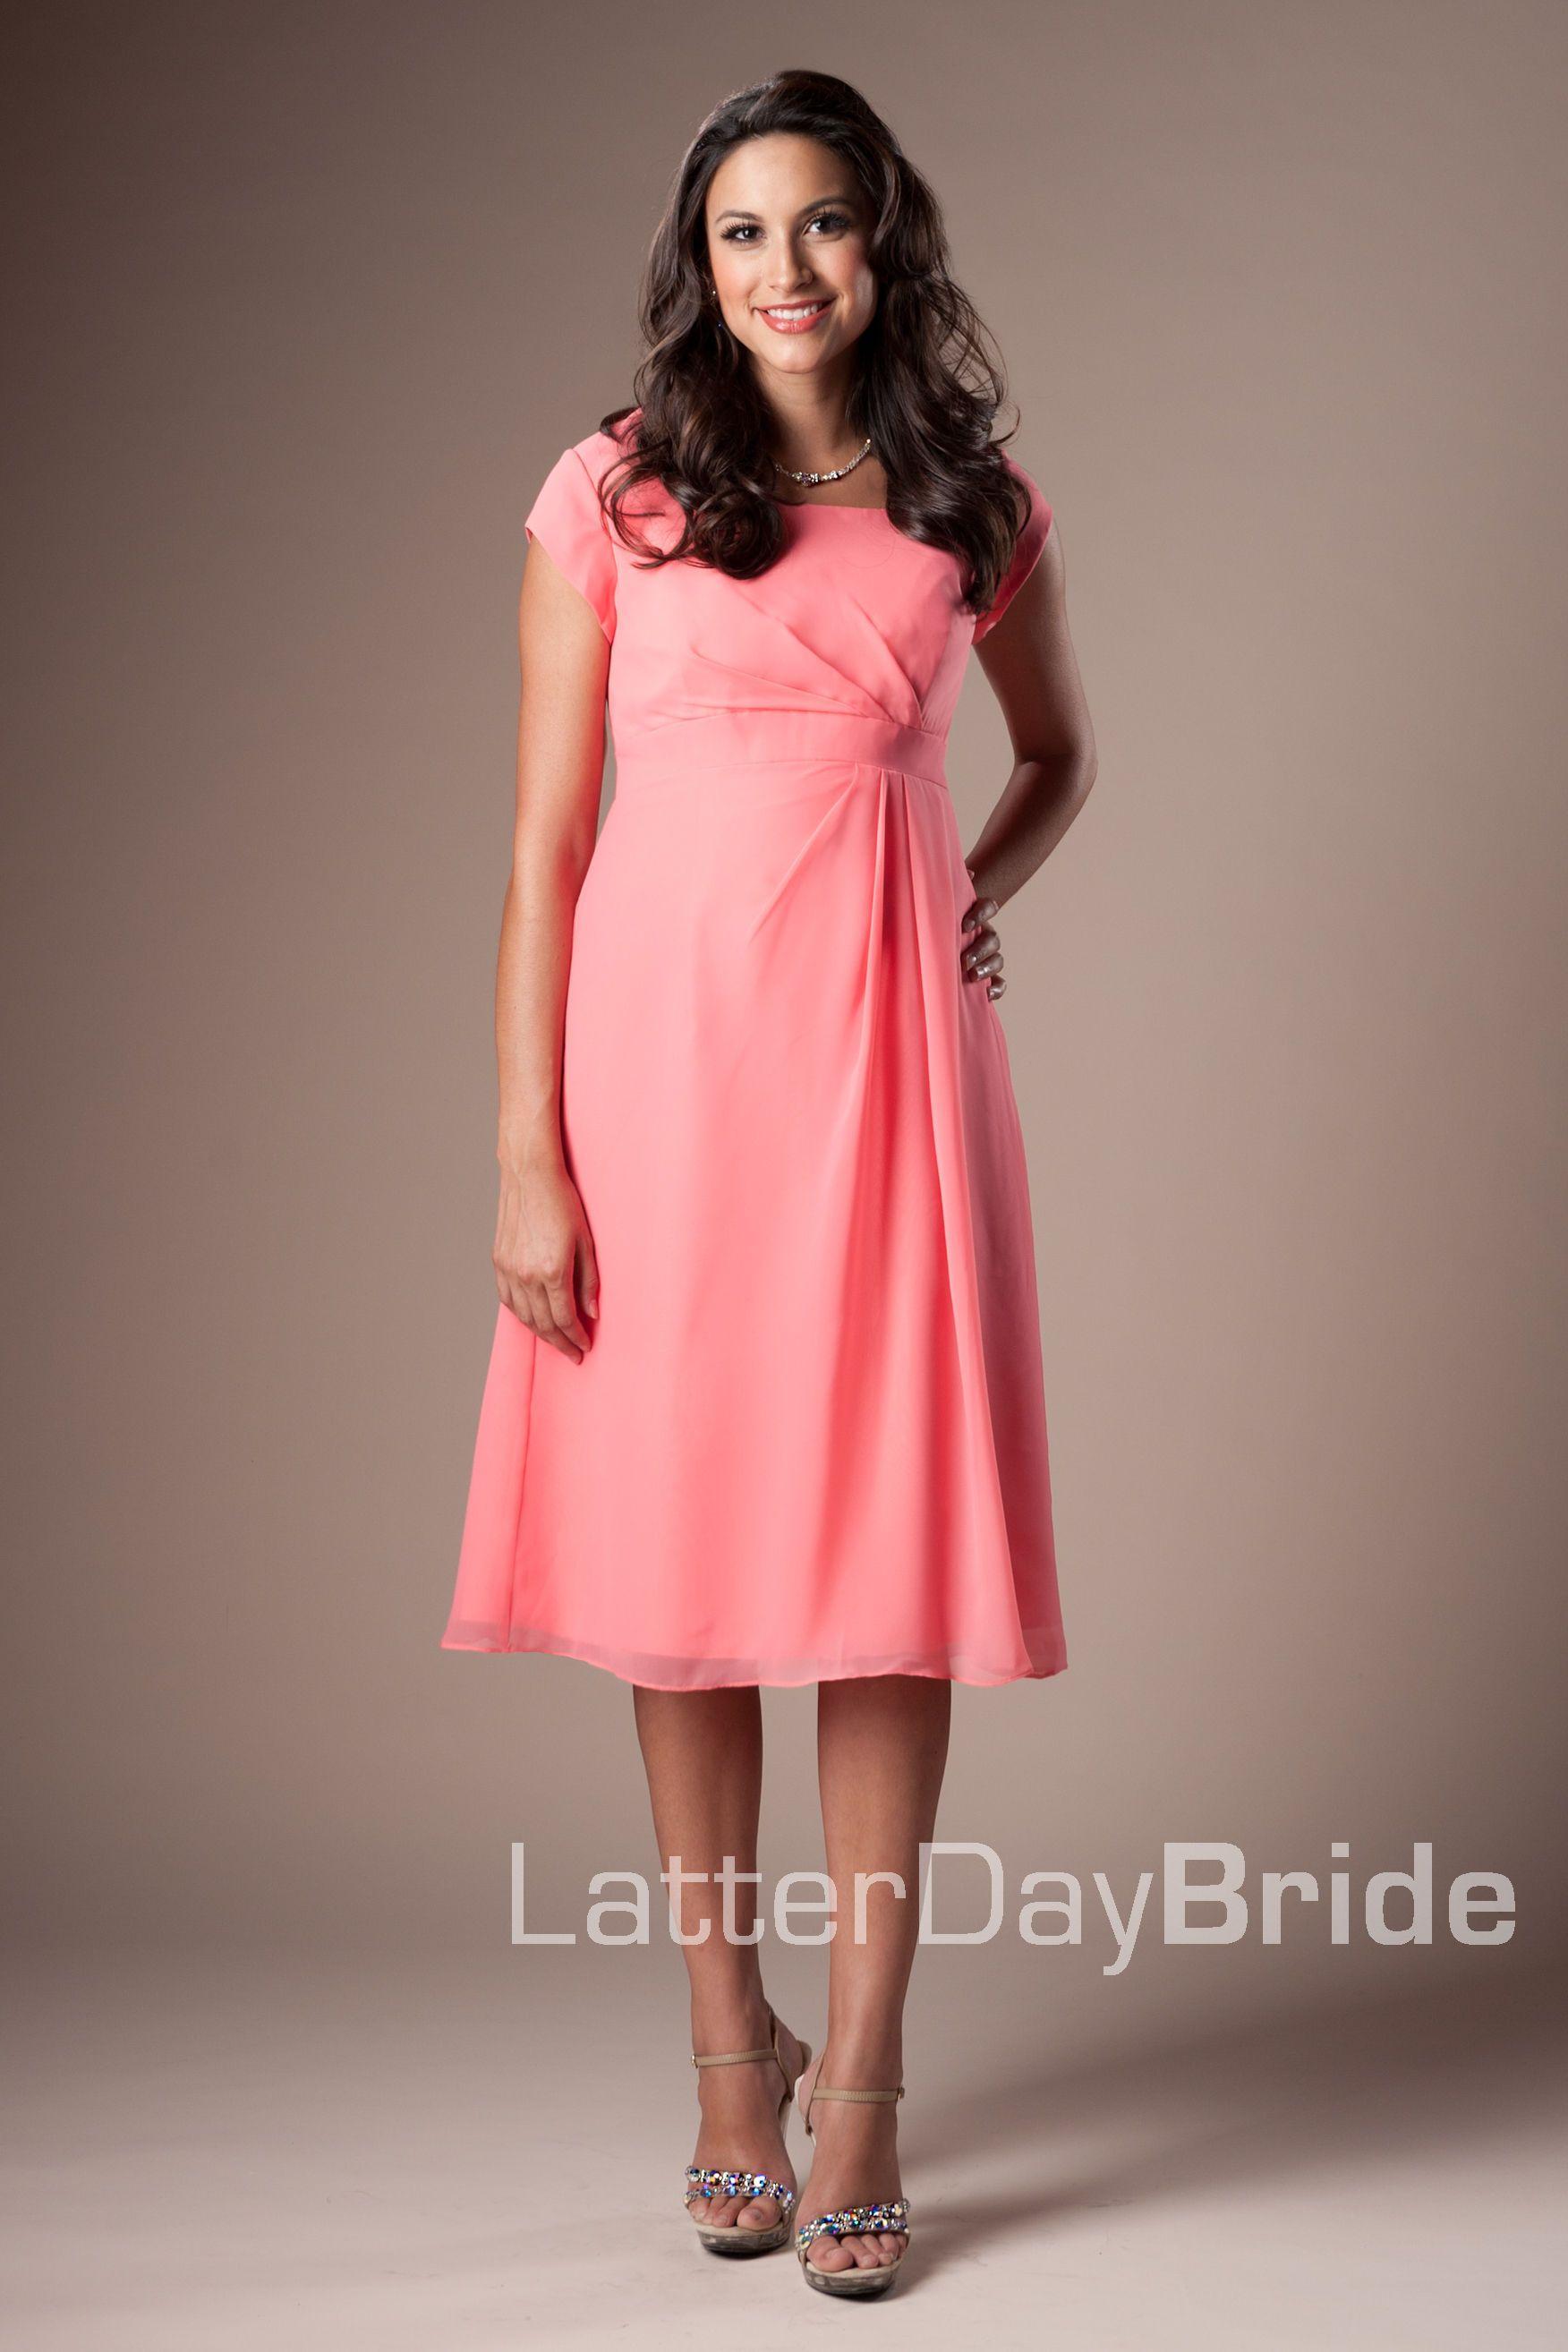 Bridesmaid & Prom, Afton   LatterDayBride & Prom Modest Mormon LDS ...